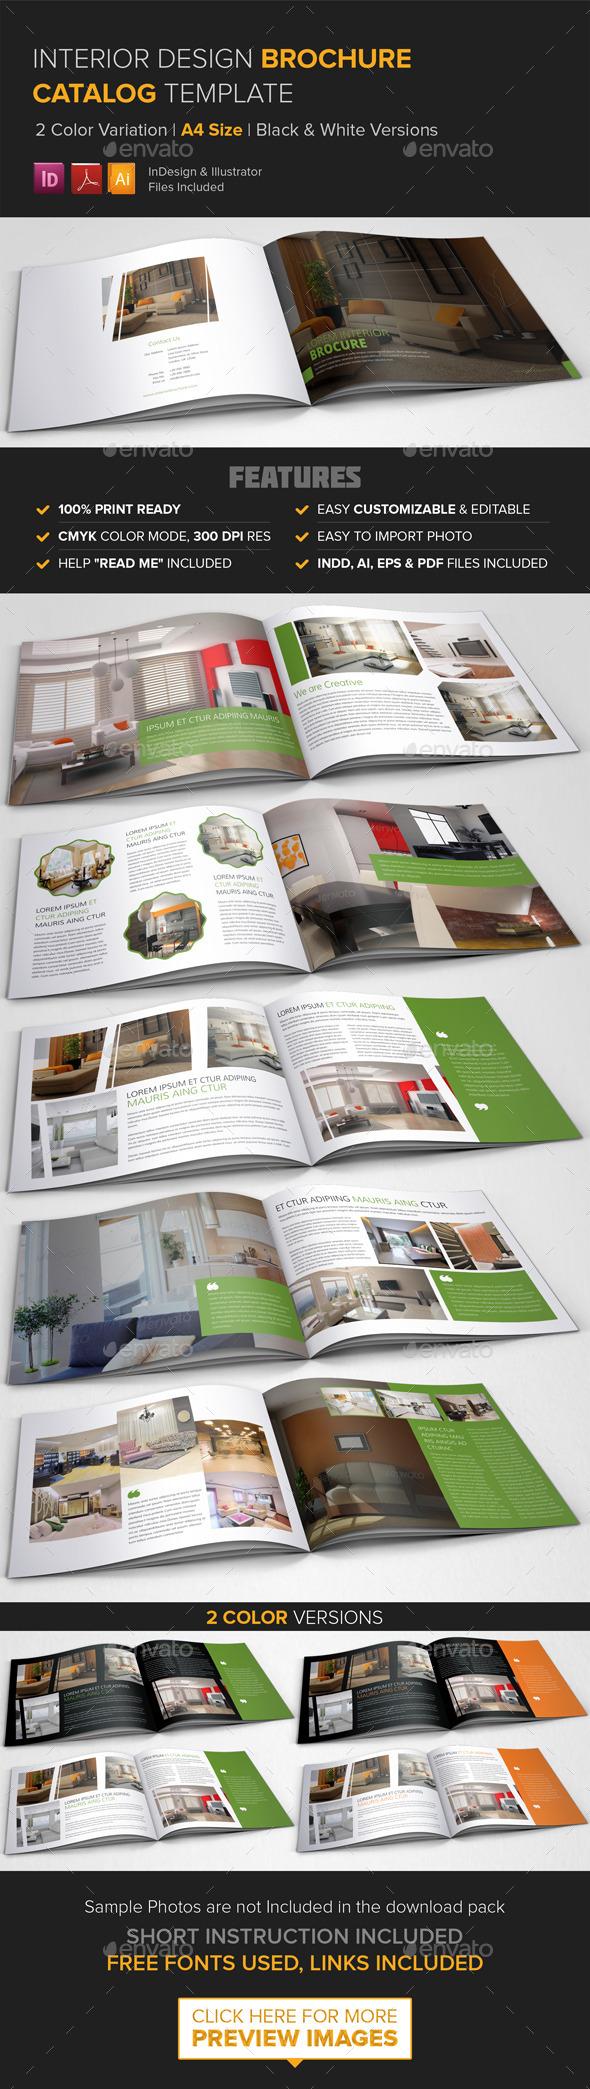 Interior Design Brochure Catalog Template - Corporate Brochures